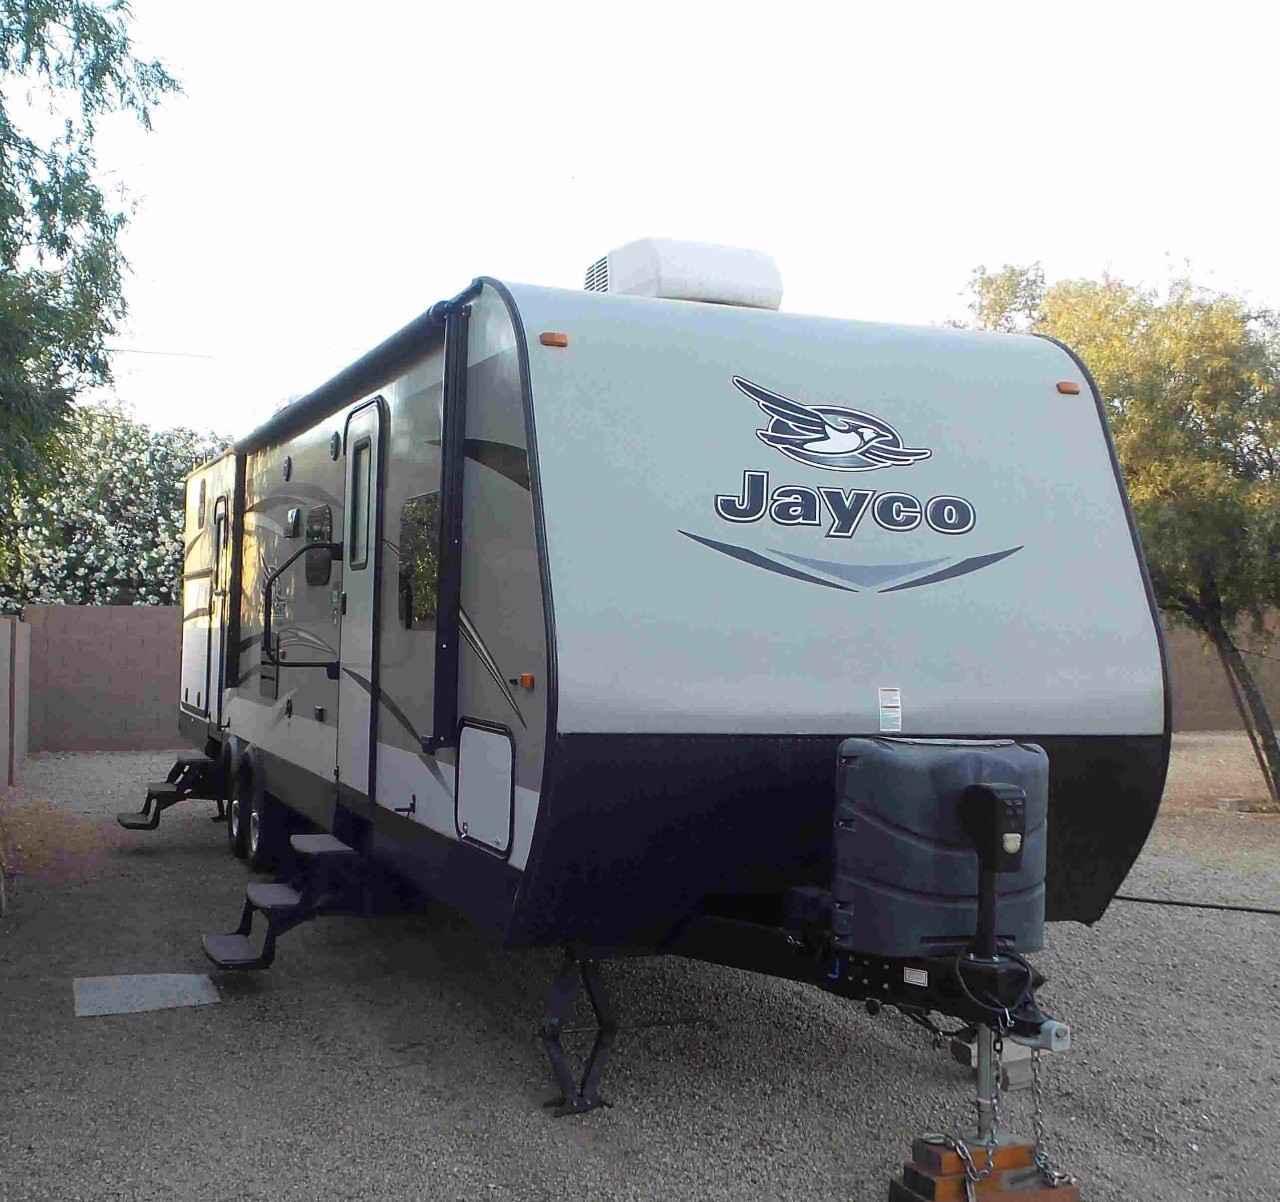 Jayco Travel Trailers: 2016 Used Jayco JAY FLIGHT 32BHDS Travel Trailer In Arizona AZ